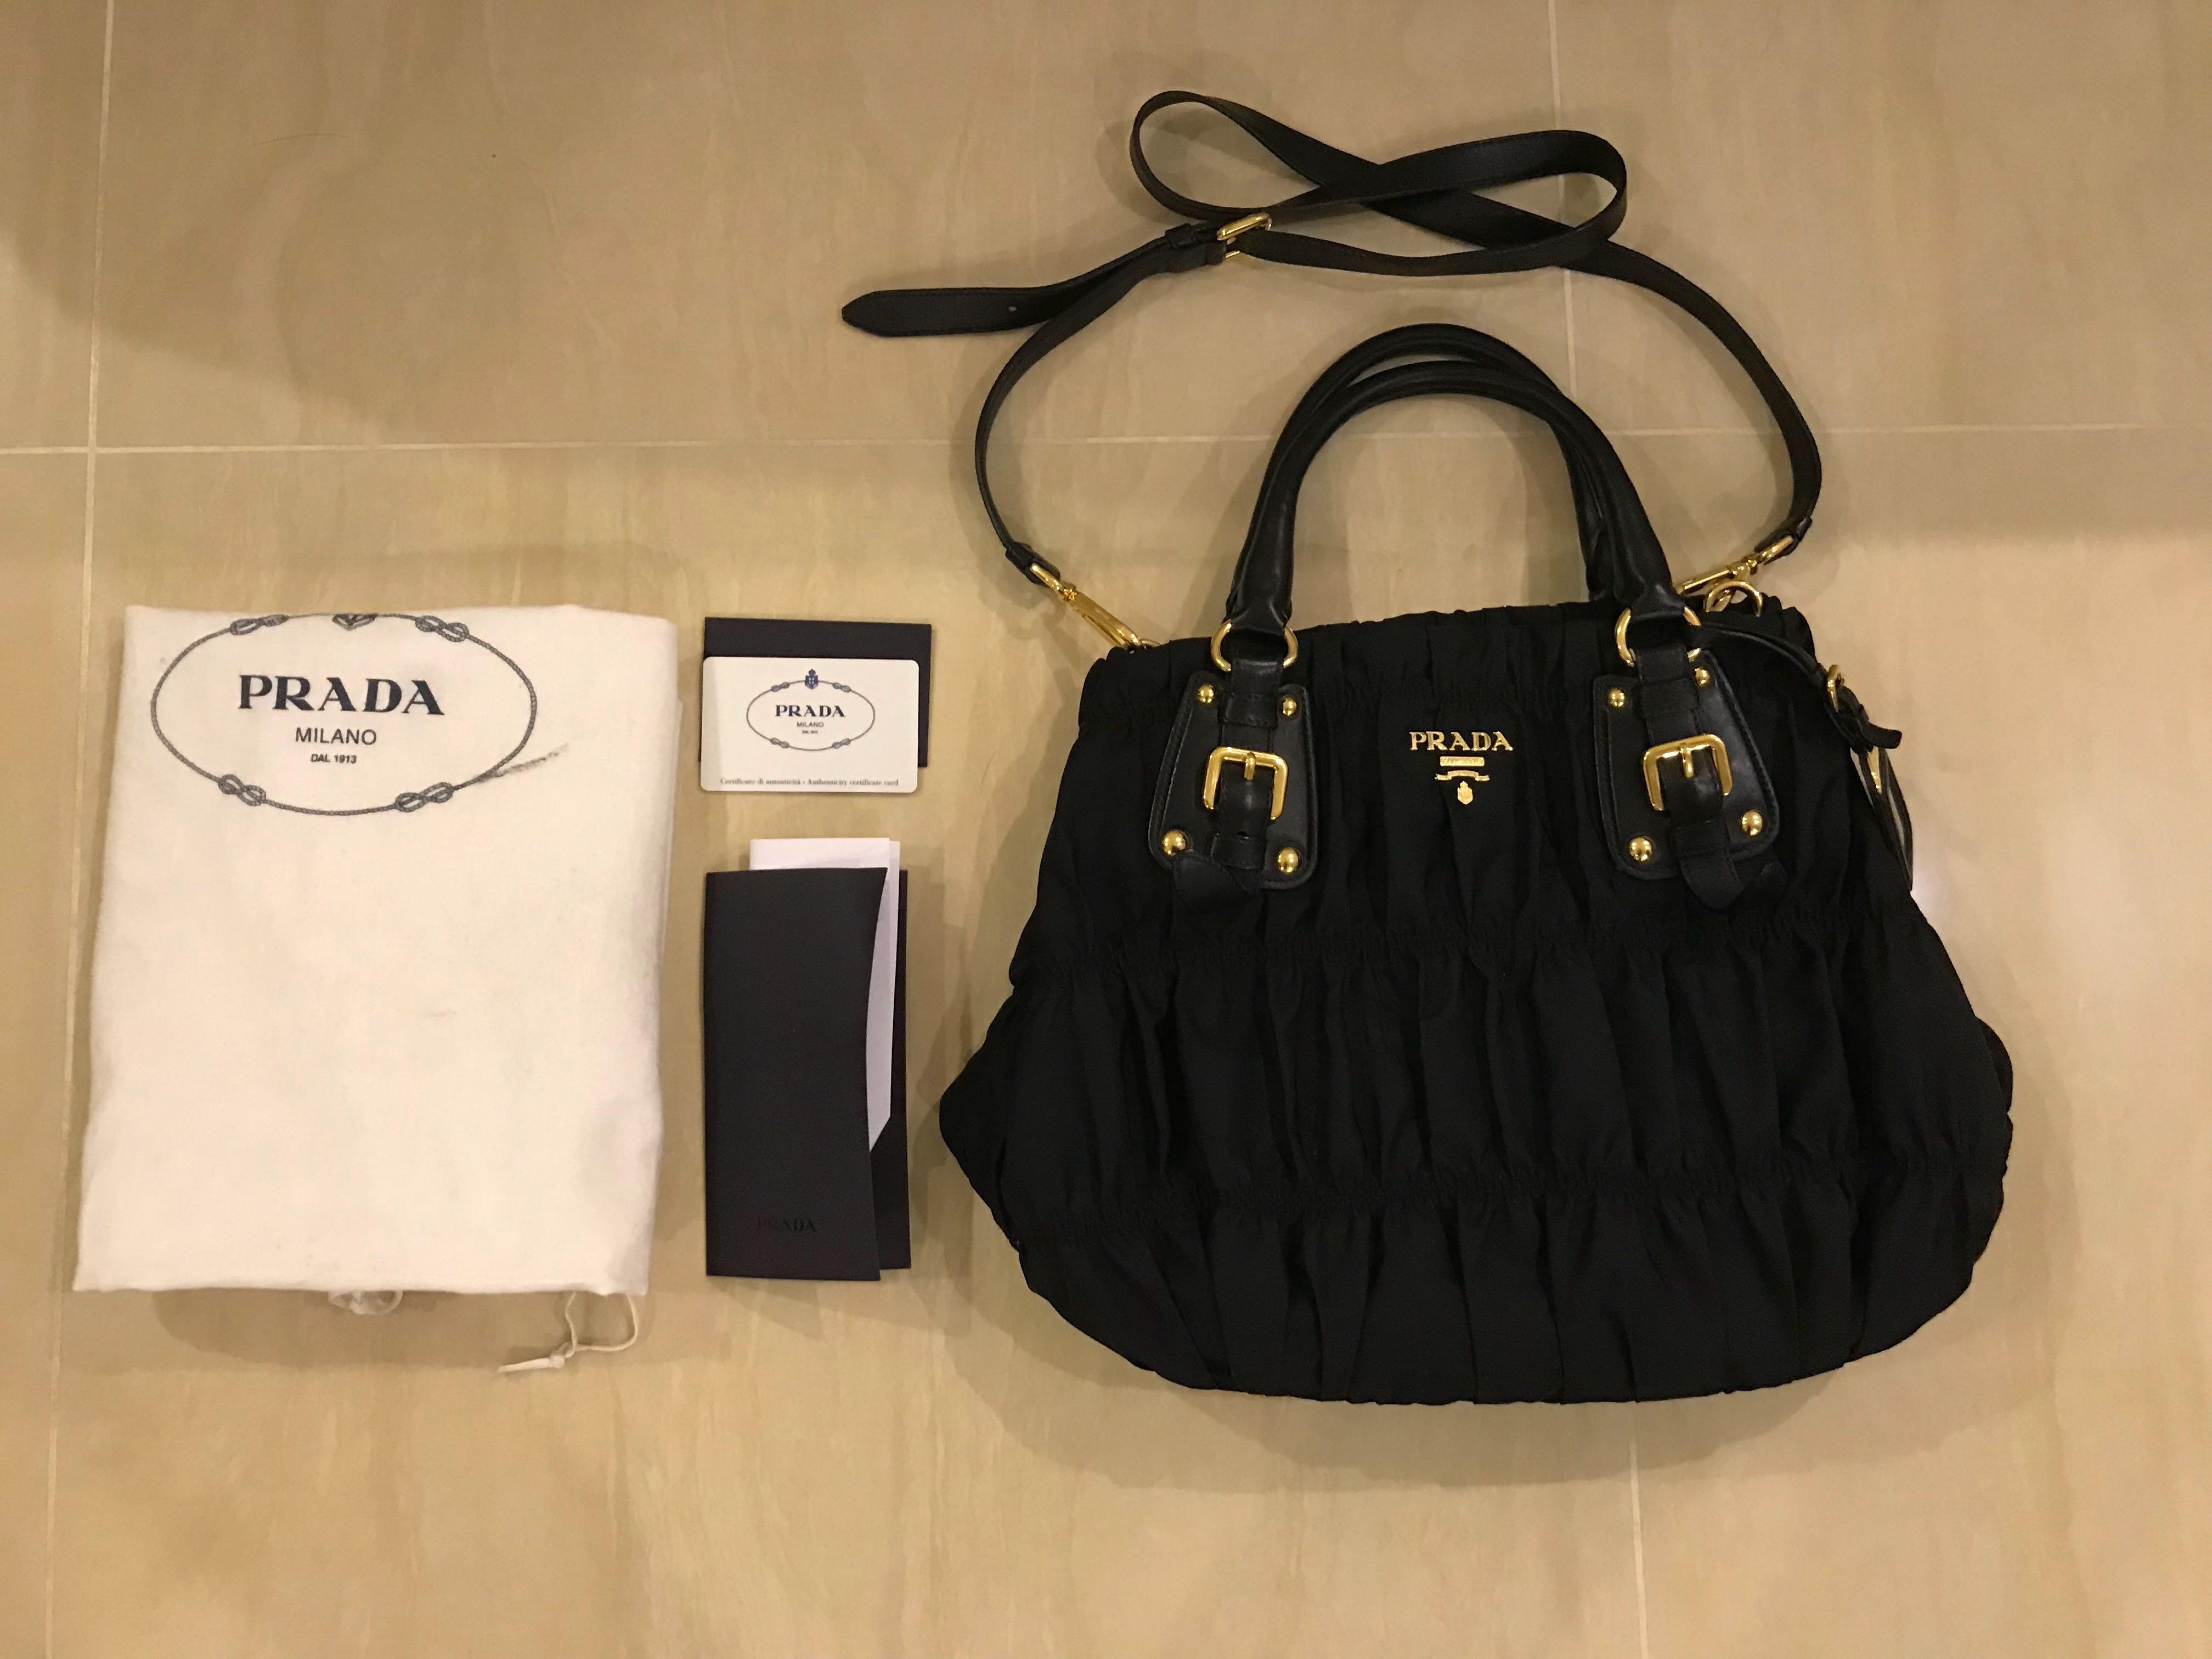 8f37b7d360 Prada Tessuto Gaufre Nero Nylon Tote Handbag BN1792 Black